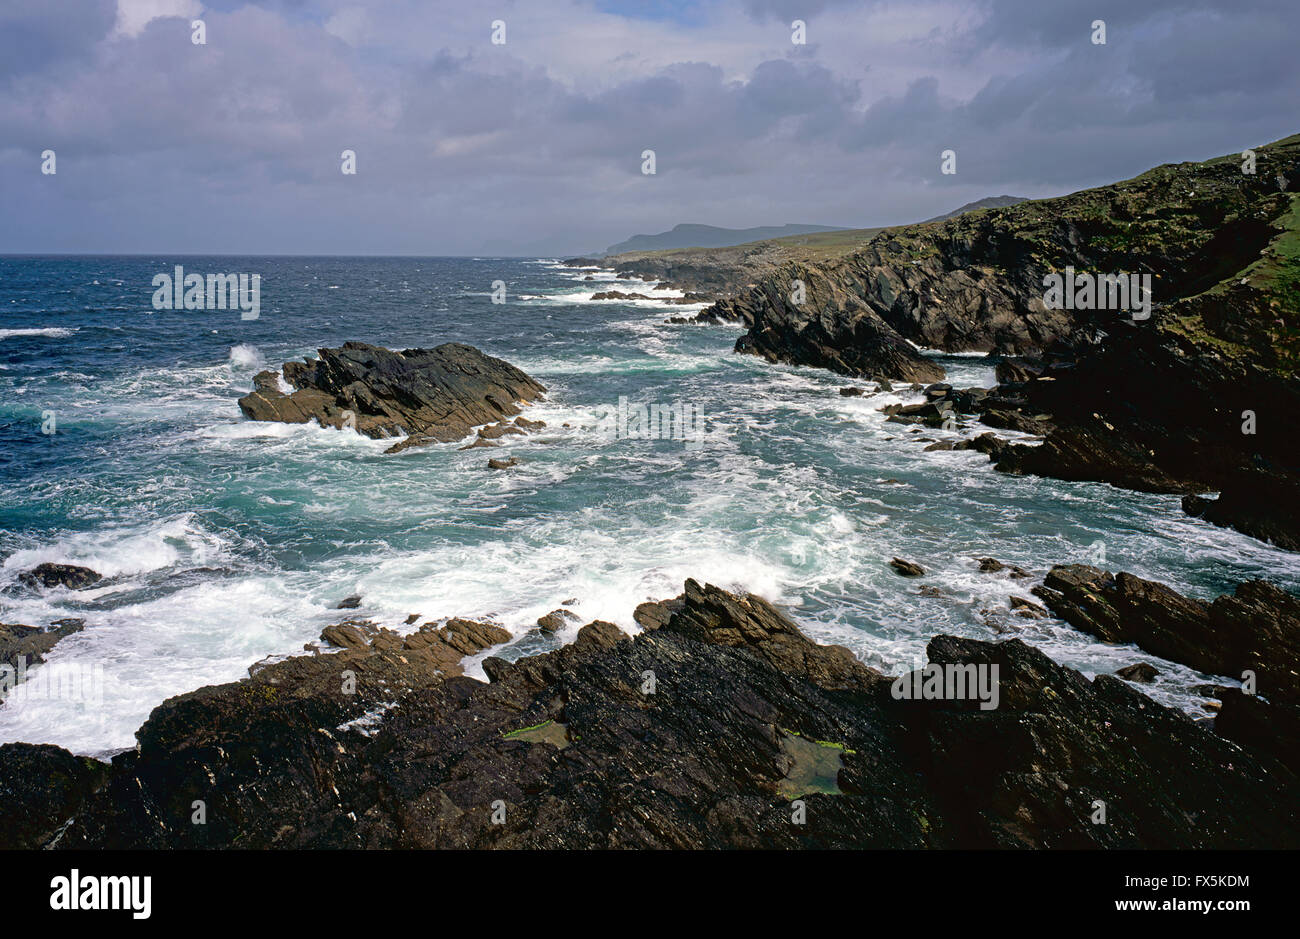 Atlantic seas of Achill Island, County Mayo, West Coast of Ireland - Stock Image